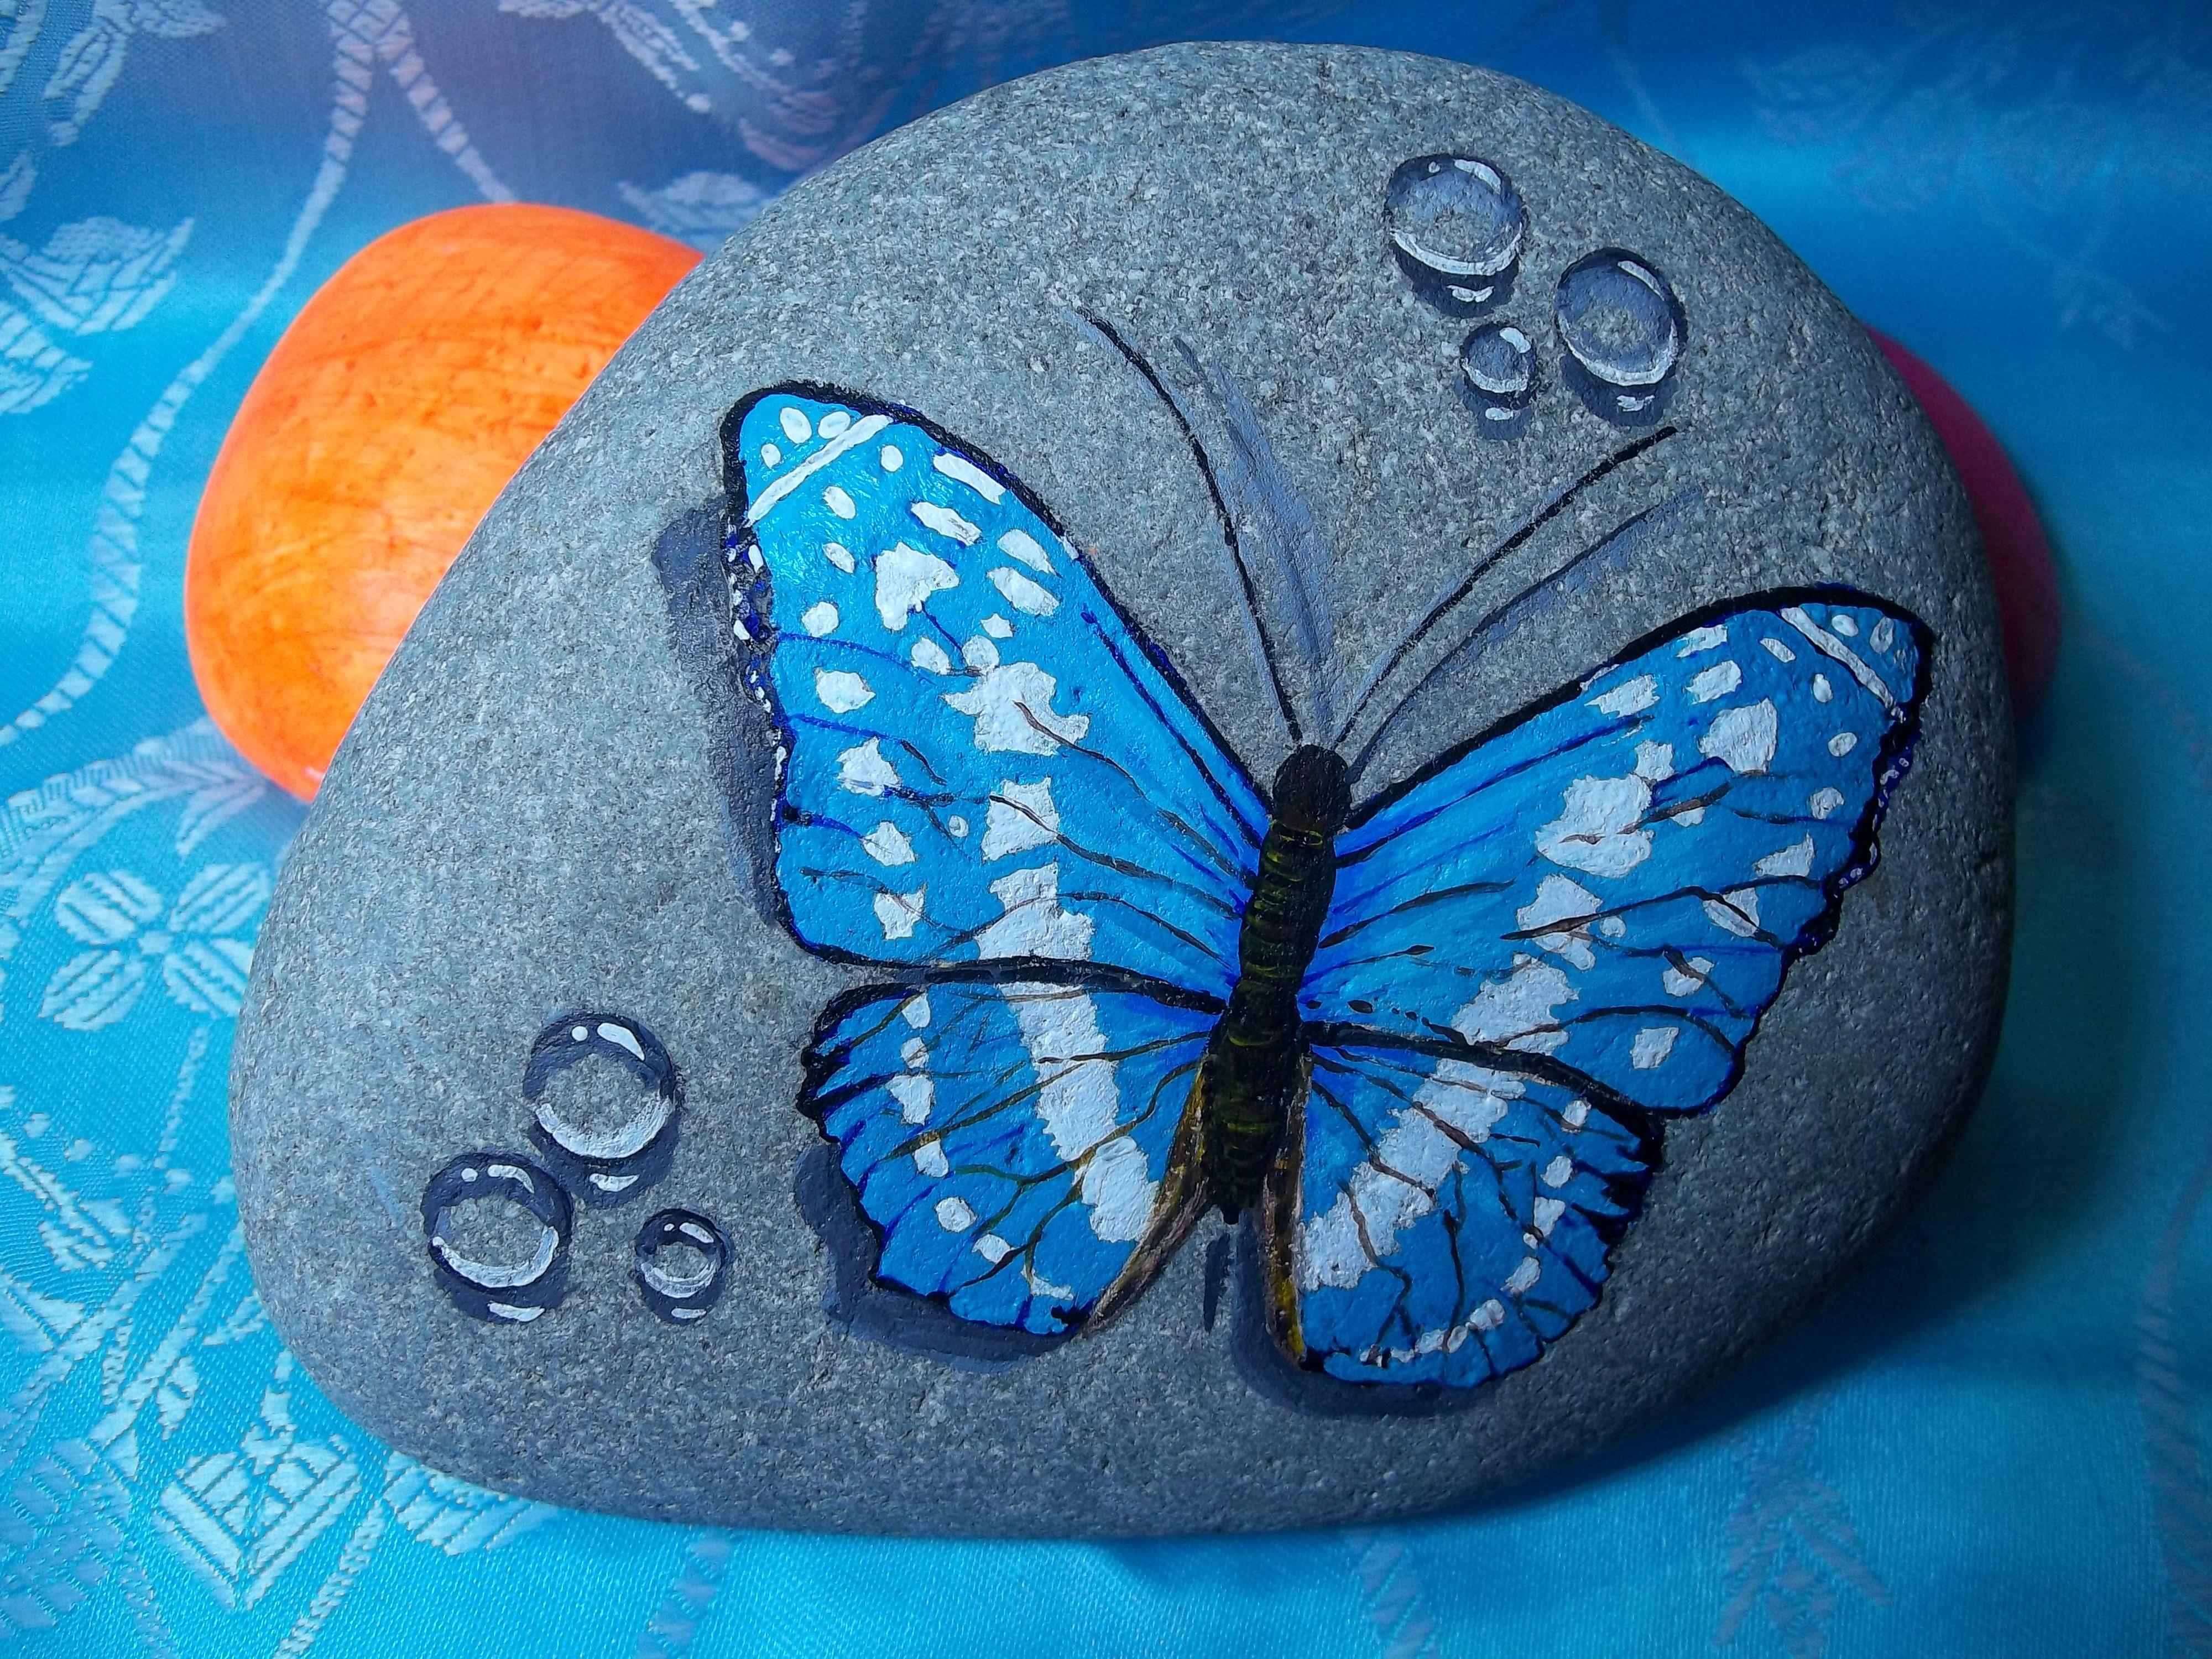 Tas Boyama Kelebek Rock Painting Art Stone Art Hand Painted Rocks